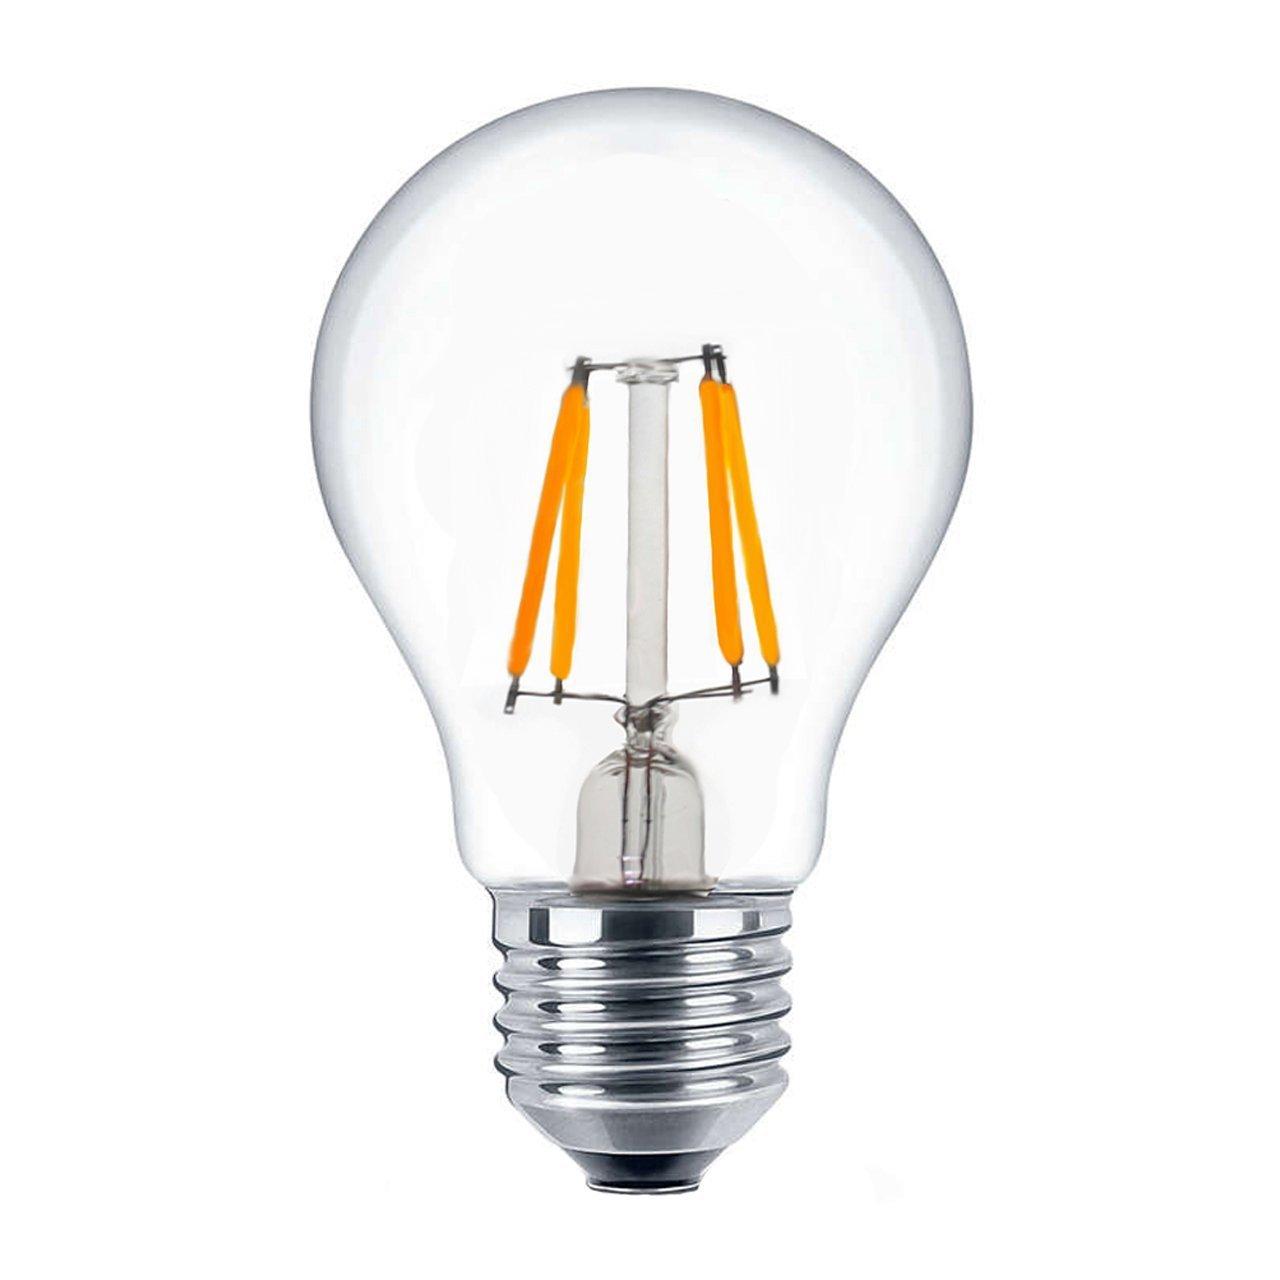 CTKcom Vintage Edison LED Light Bulbs 4W(4 Pack)- A19 Antique Globe Bulbs 40W Equivalent Warm White 2700K Lamps,for Home Light Fixtures Squirrel Cage Filament 110V E26/E27 Base